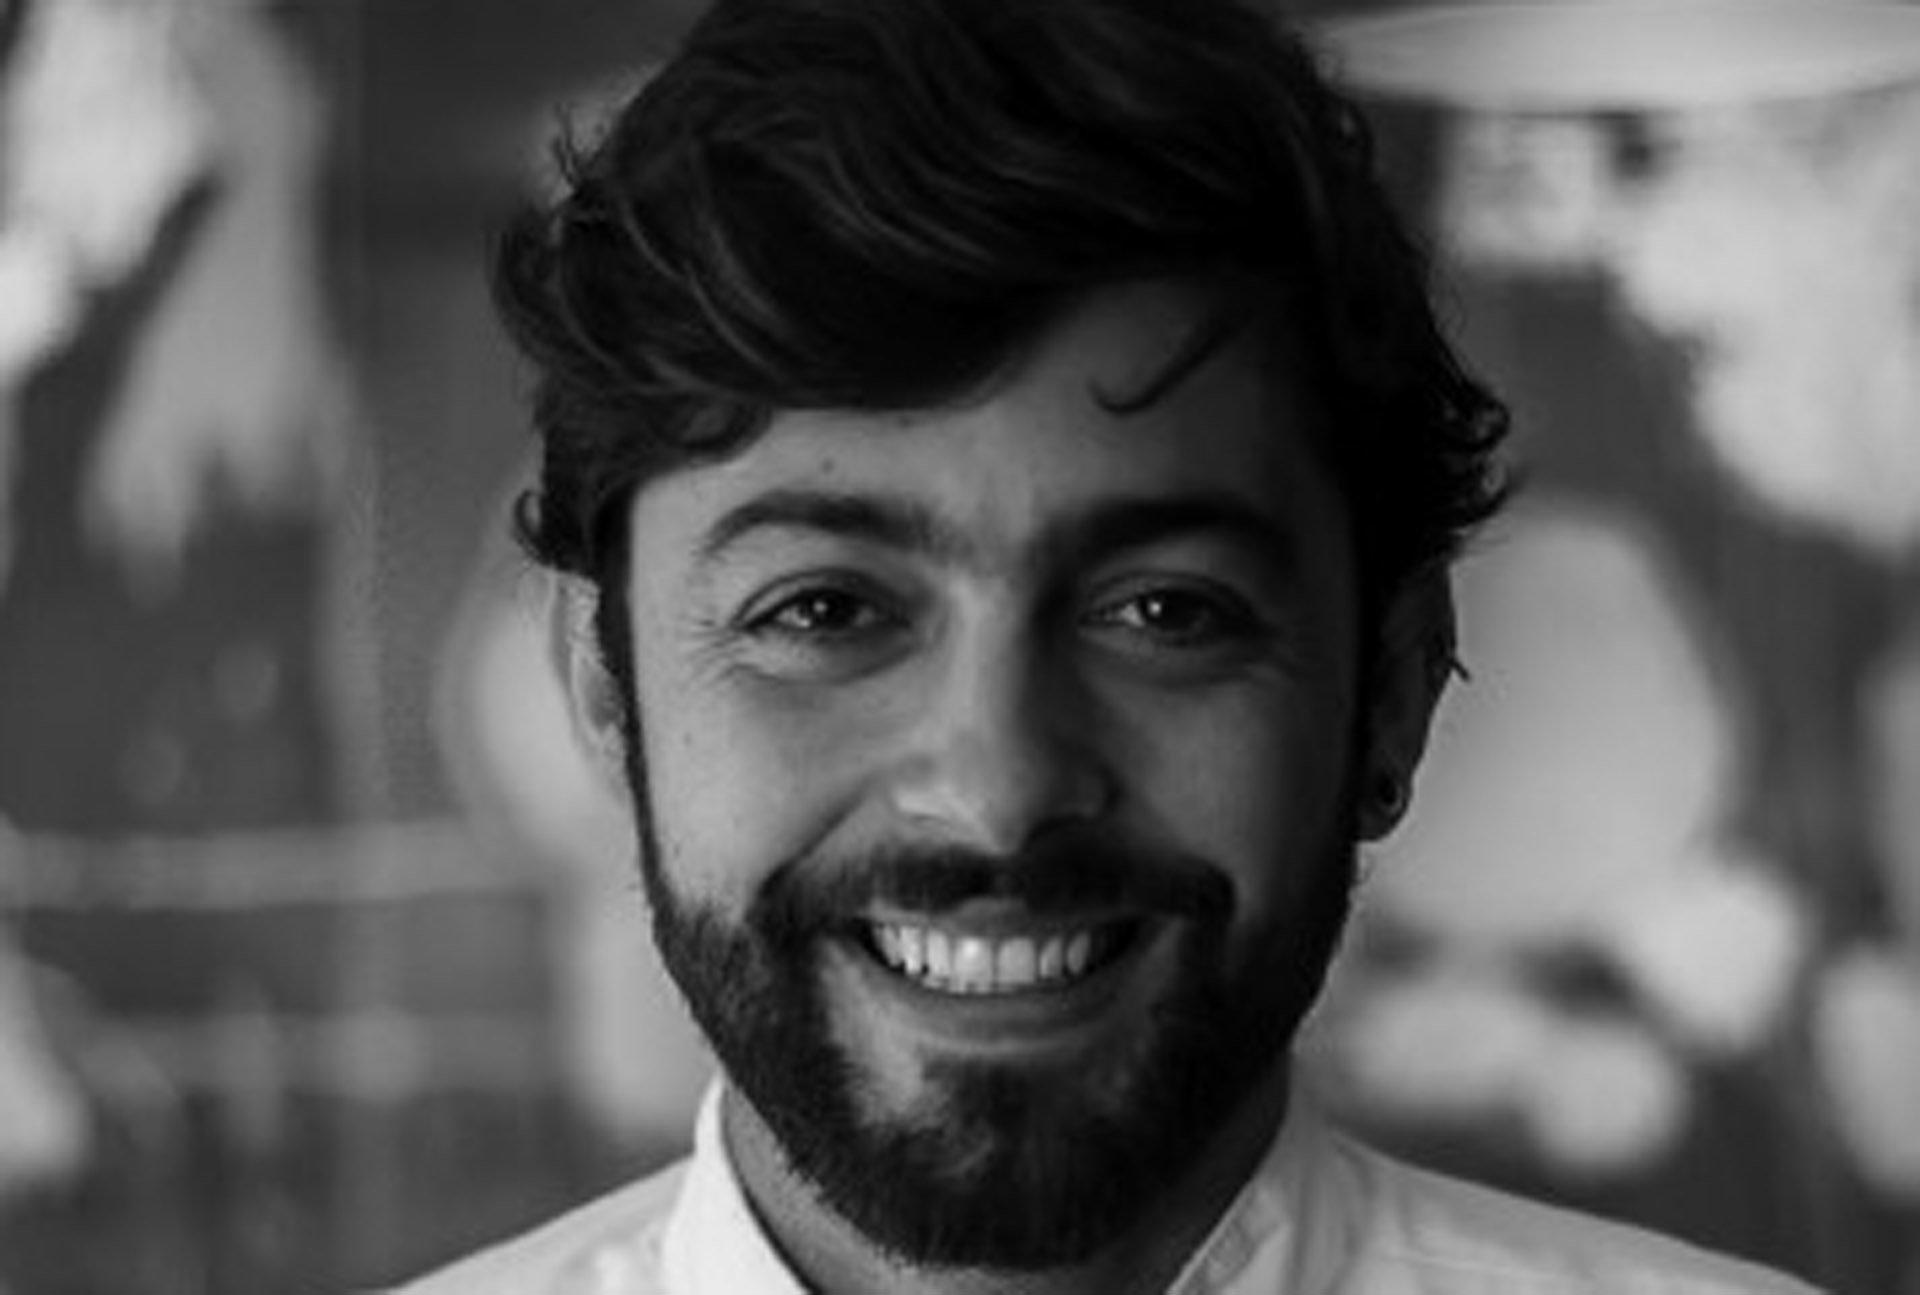 Pablo Naranjo Agular Le Cordon Bleu Paris diplômée